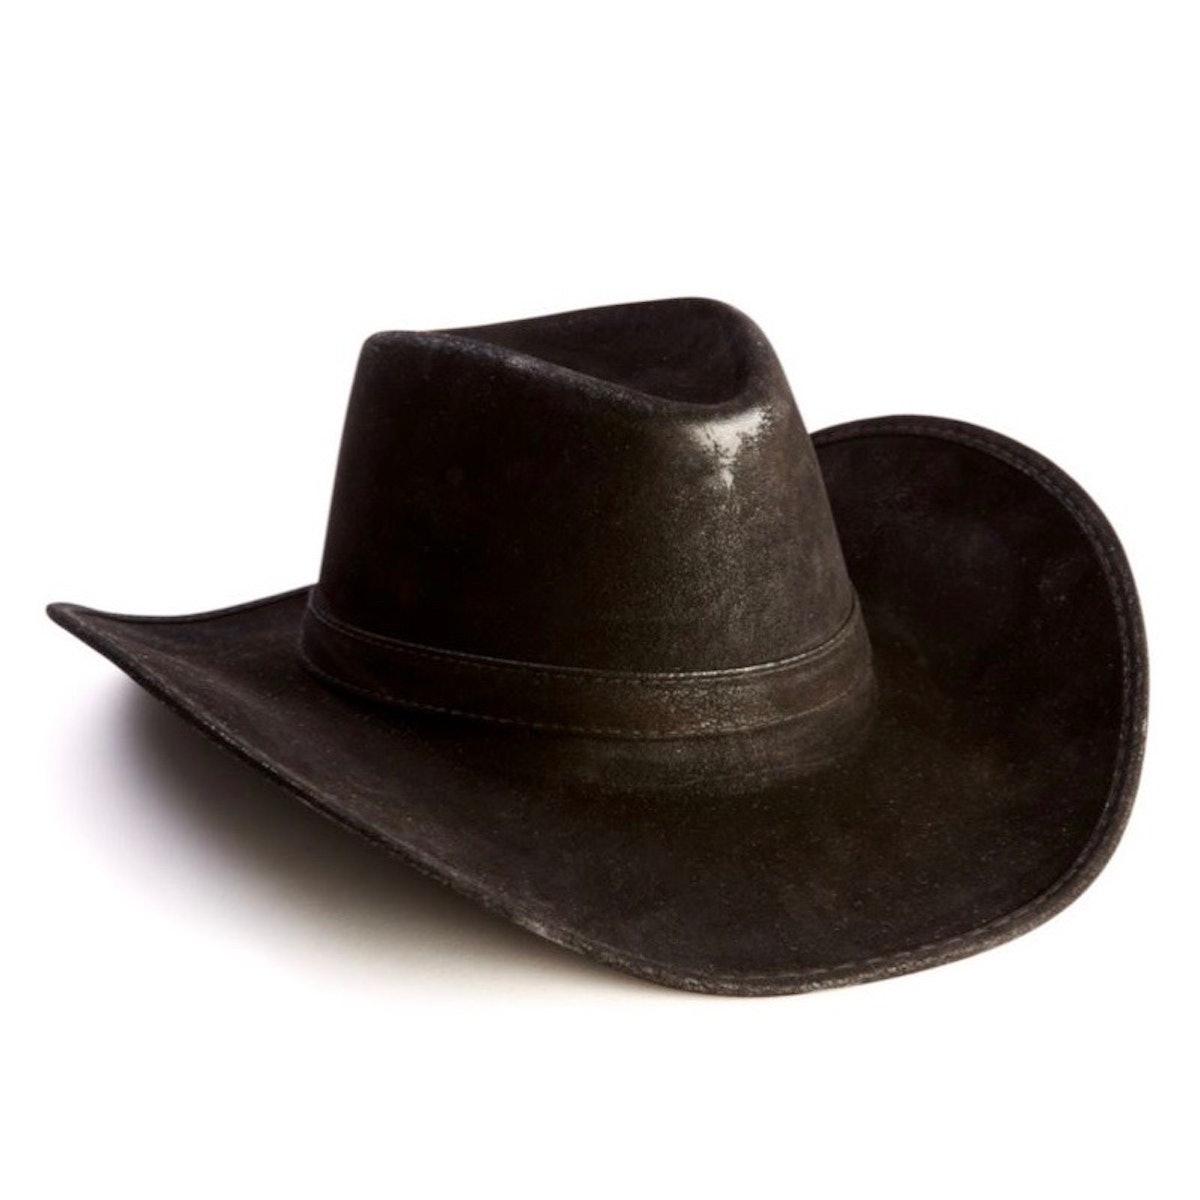 Black Cowboy Hat - Deluxe